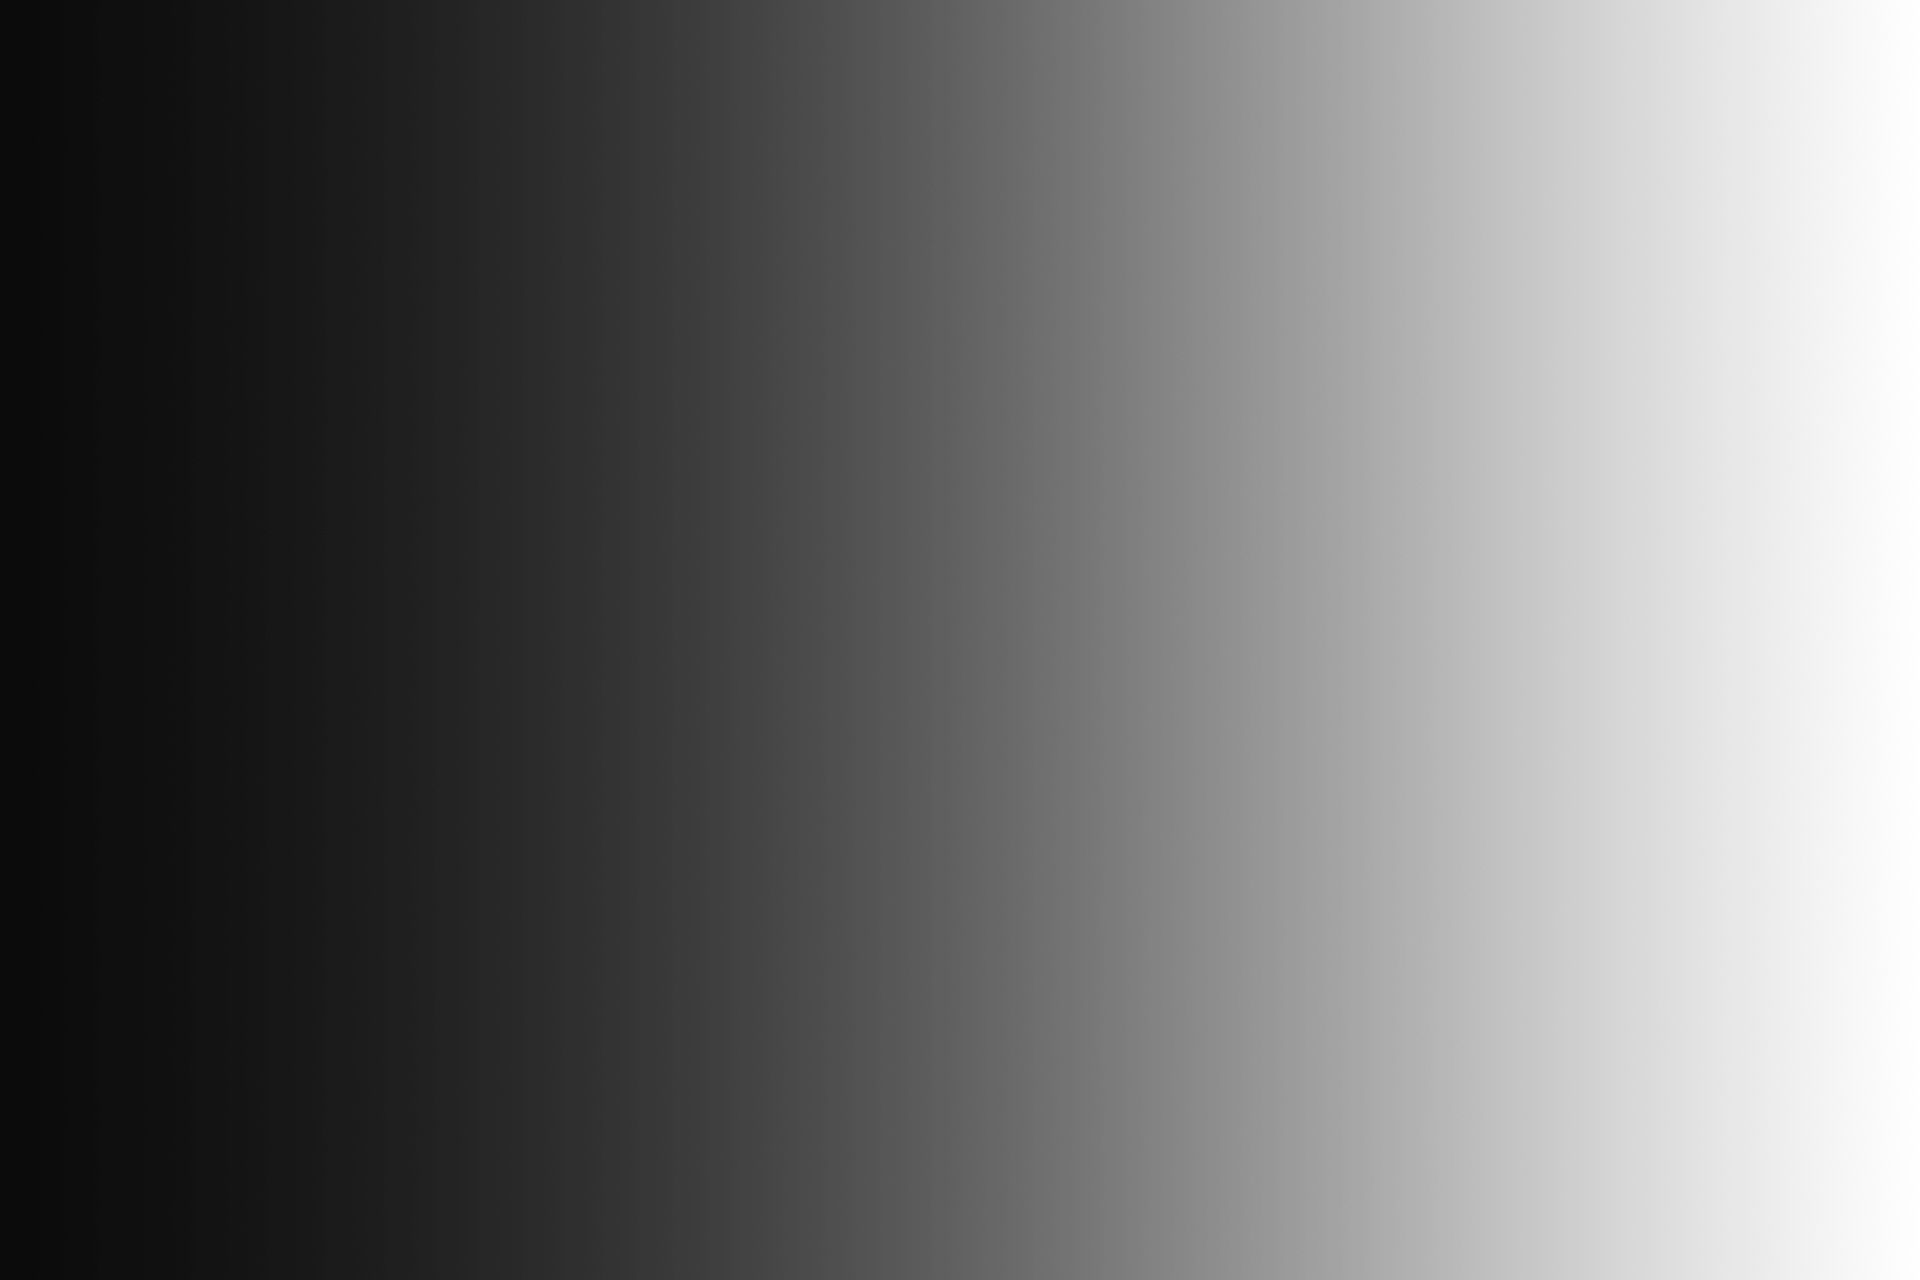 transparent black background - HD1920×1280